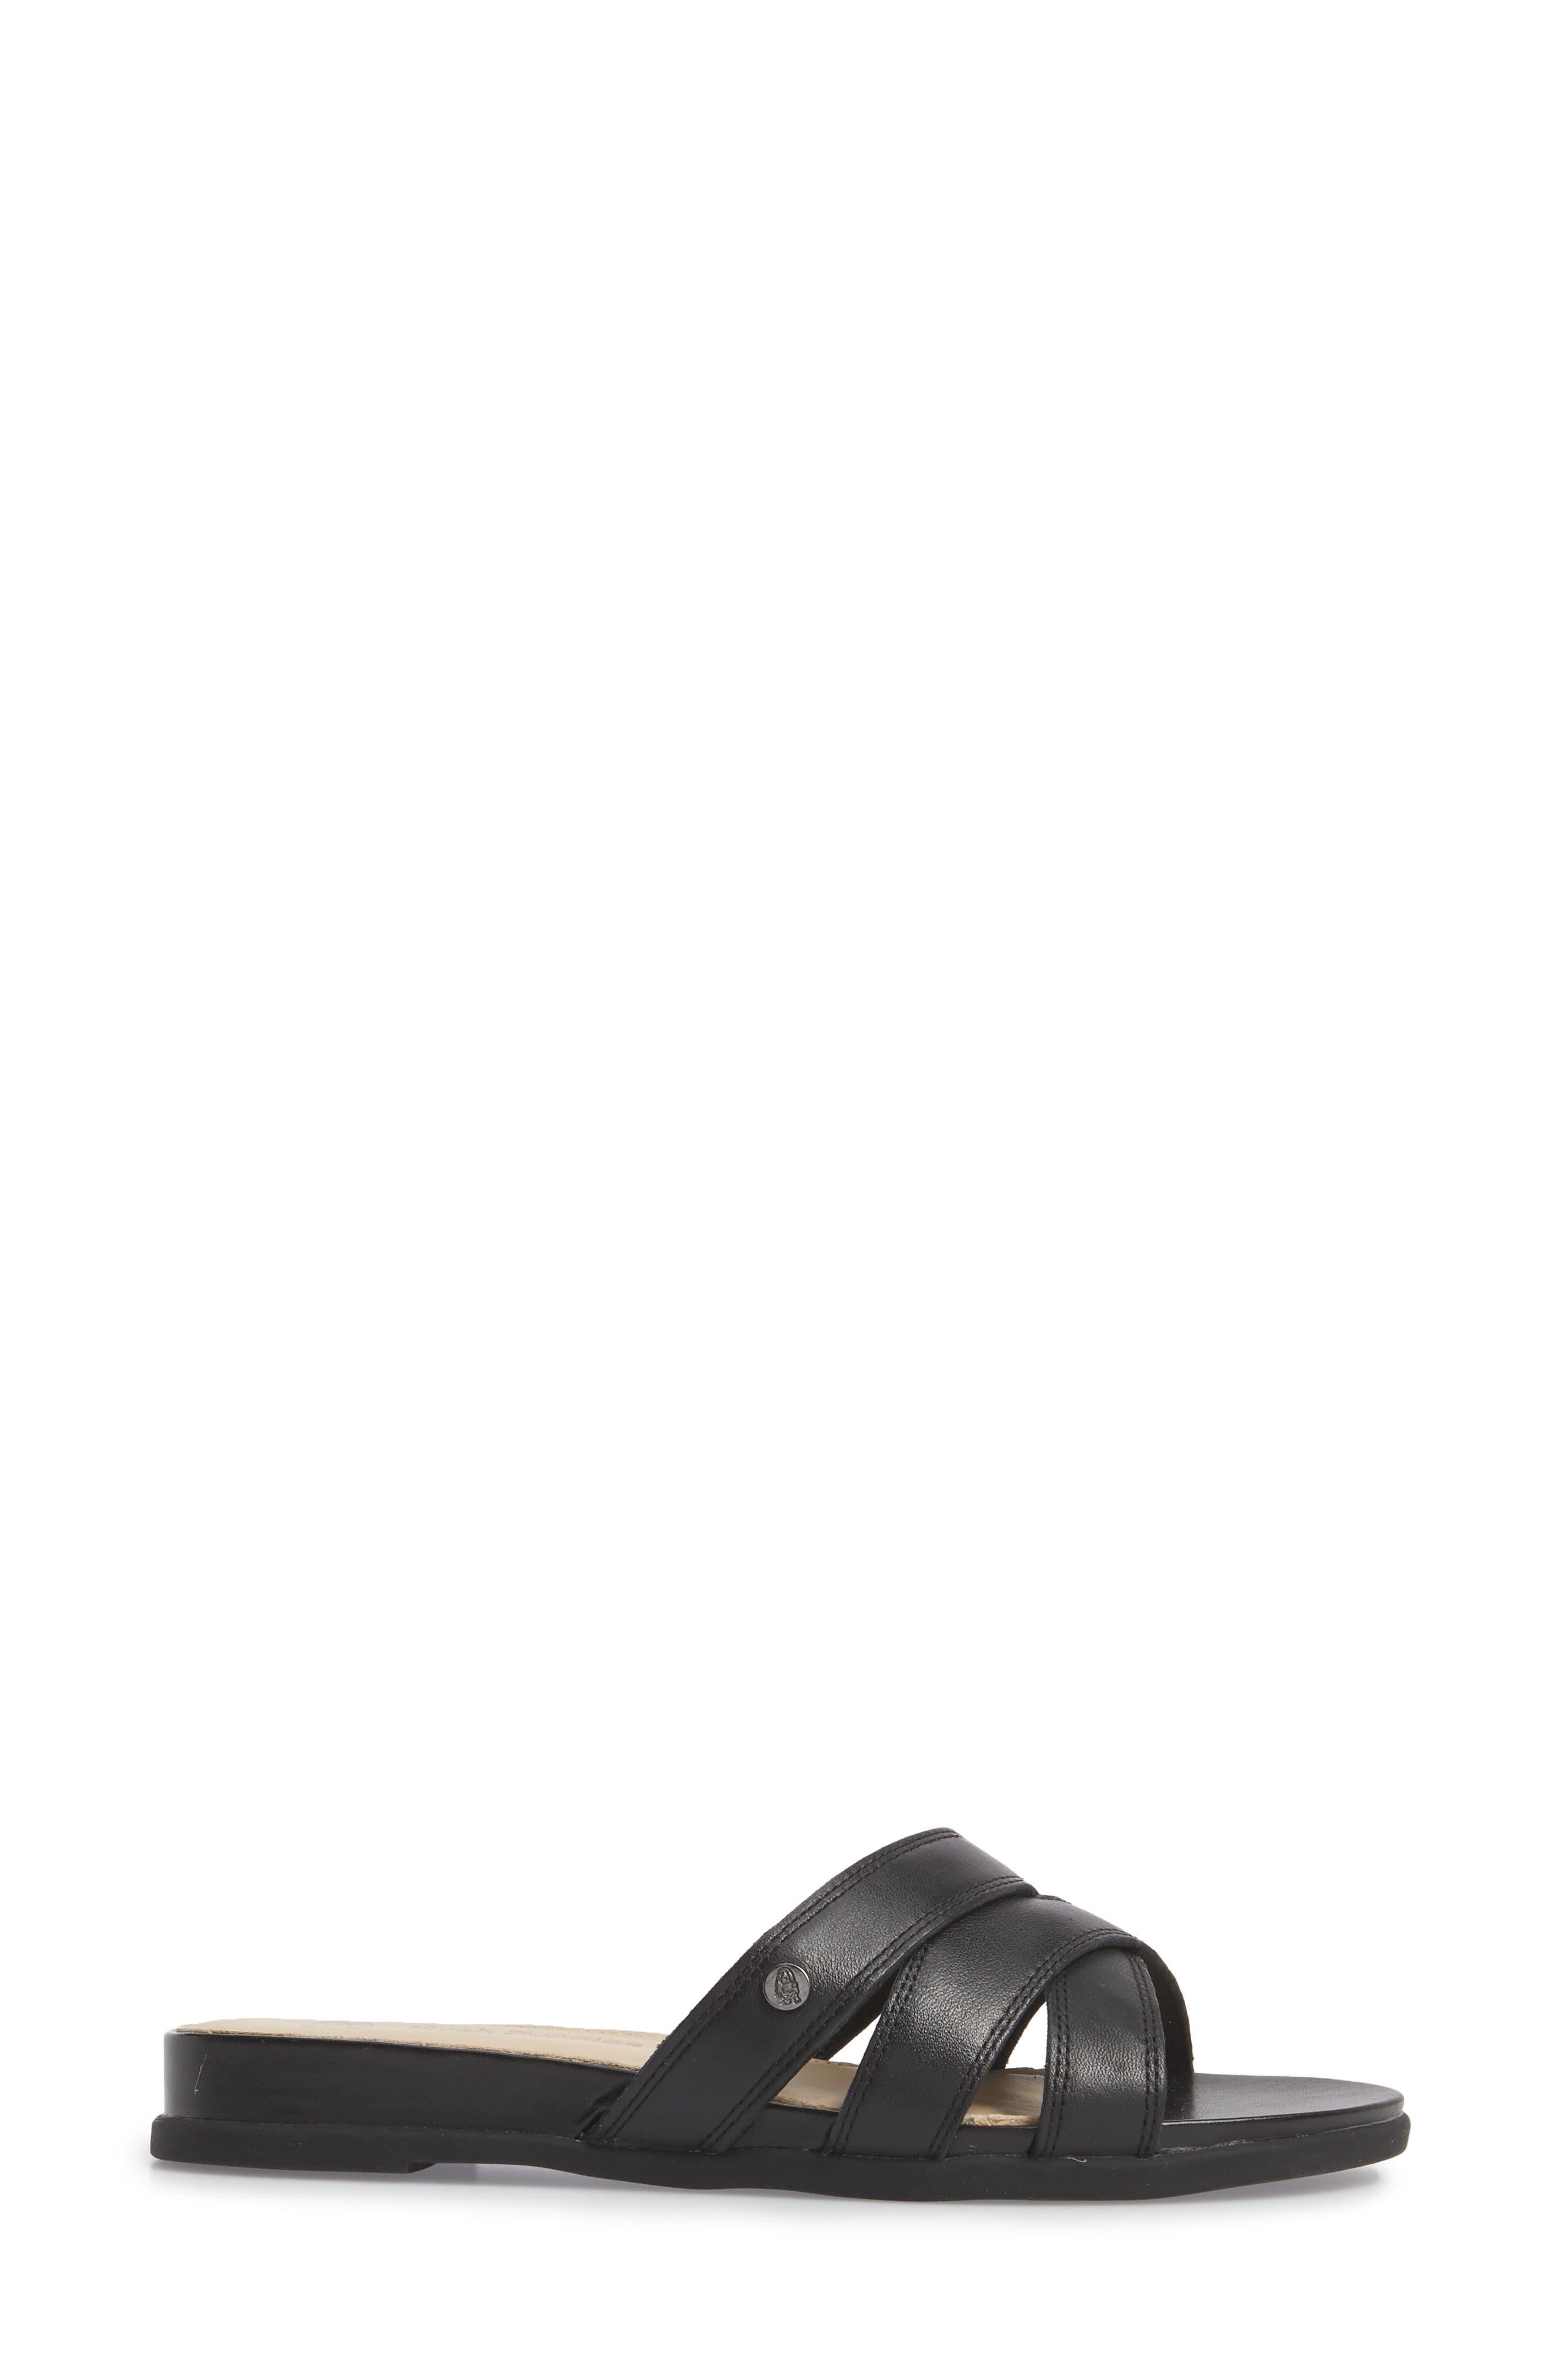 Dalmatian Slide Sandal,                             Alternate thumbnail 3, color,                             007